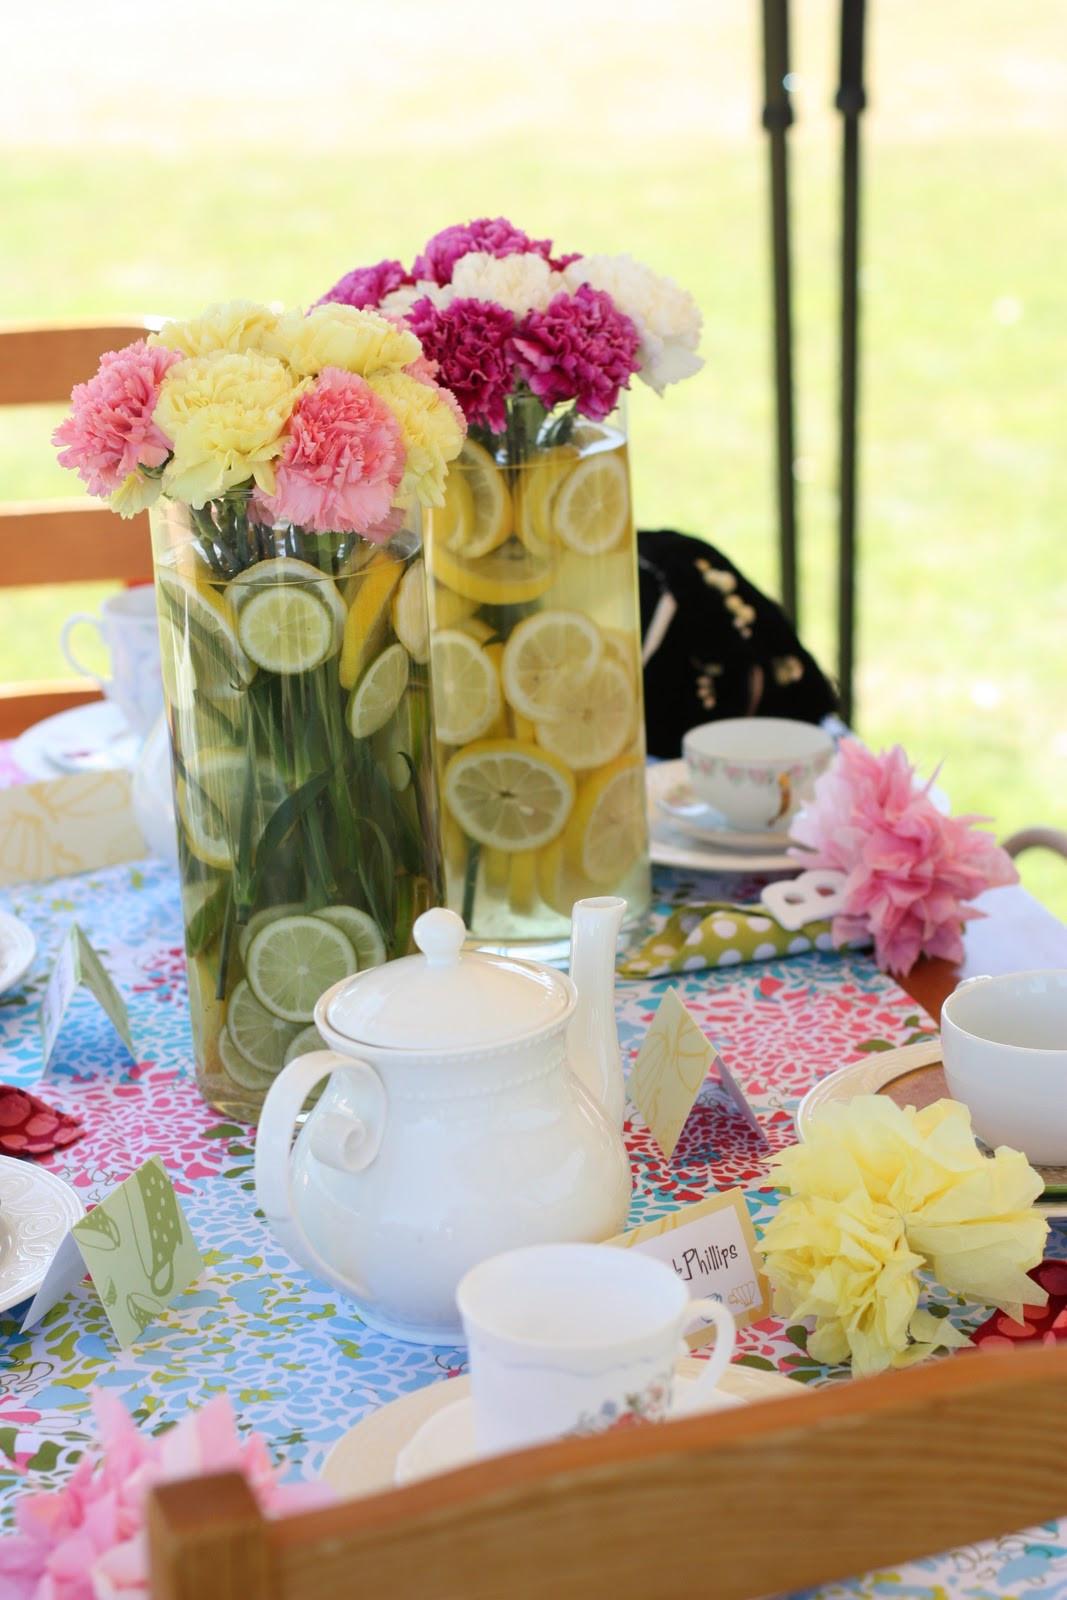 Tea Party Themes Ideas  Kara s Party Ideas Mother Daughter Tea Party 3rd Birthday